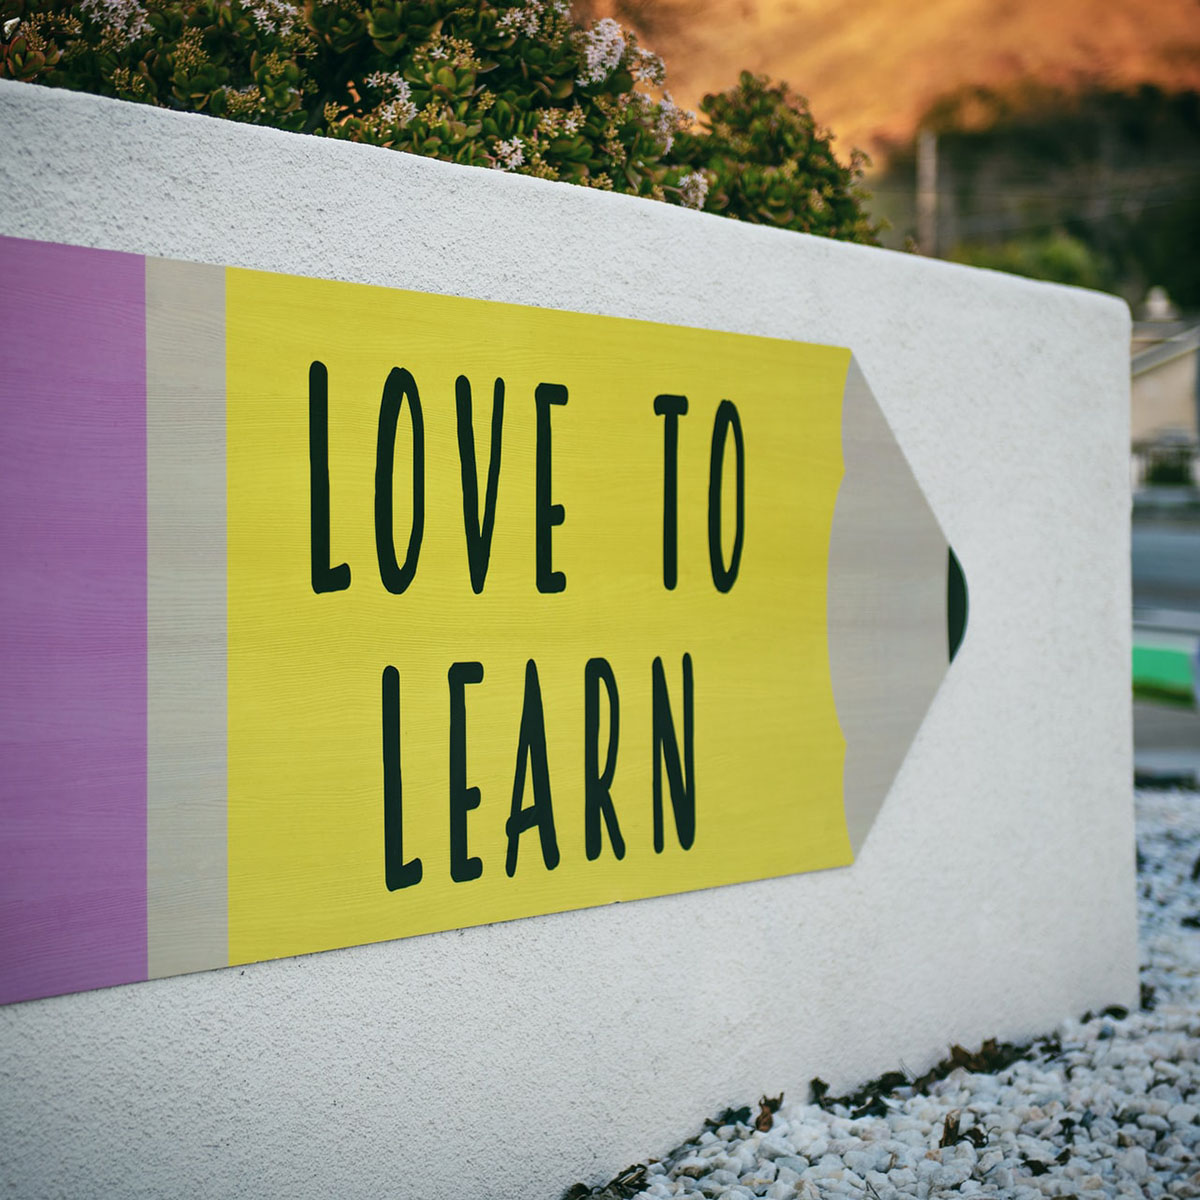 Love to Learn written on pencil